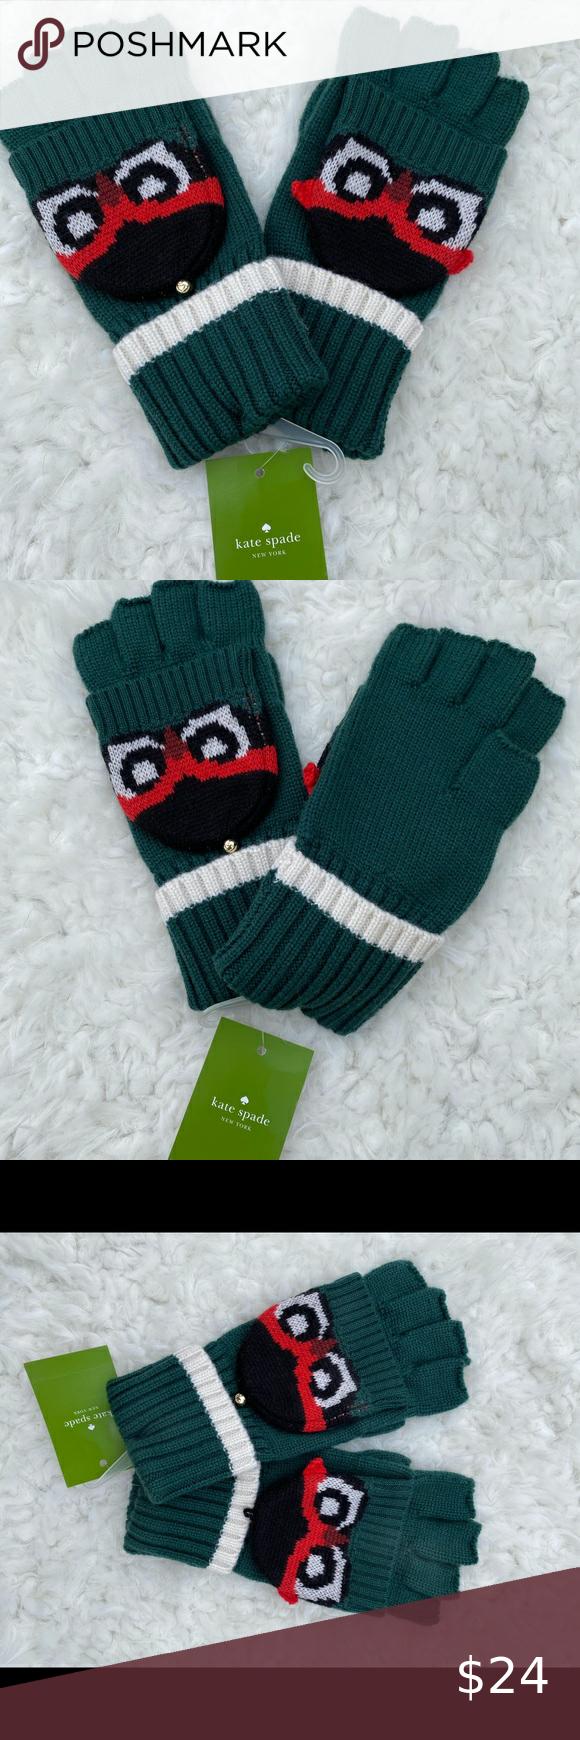 Kate Spade Fingerless Gloves In 2020 Kate Spade Fingerless Fingerless Gloves